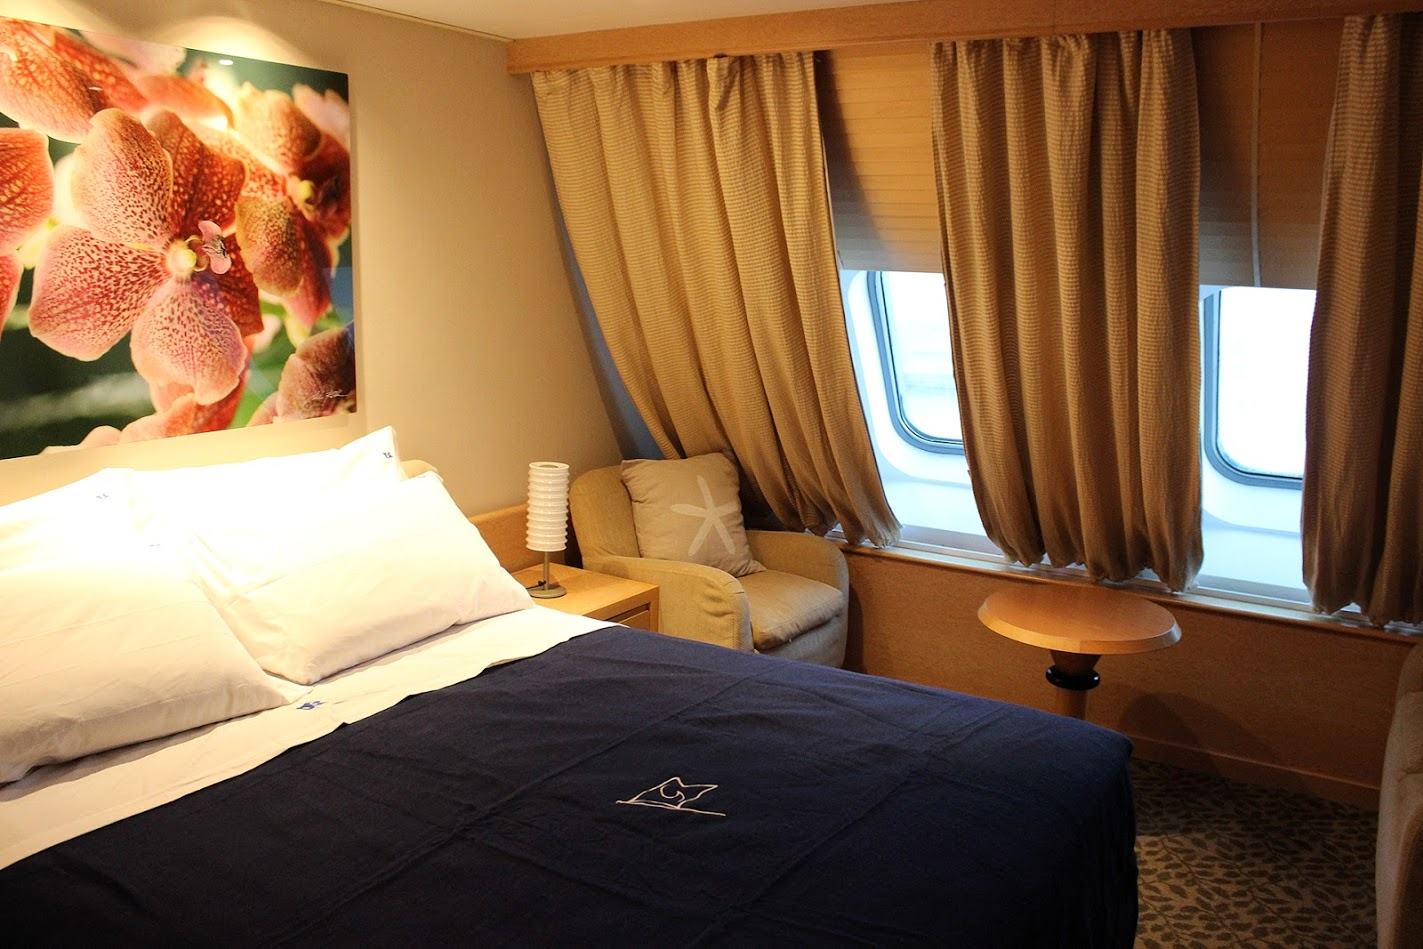 Passenger/Ro-Ro Europa Palace Lux cabin